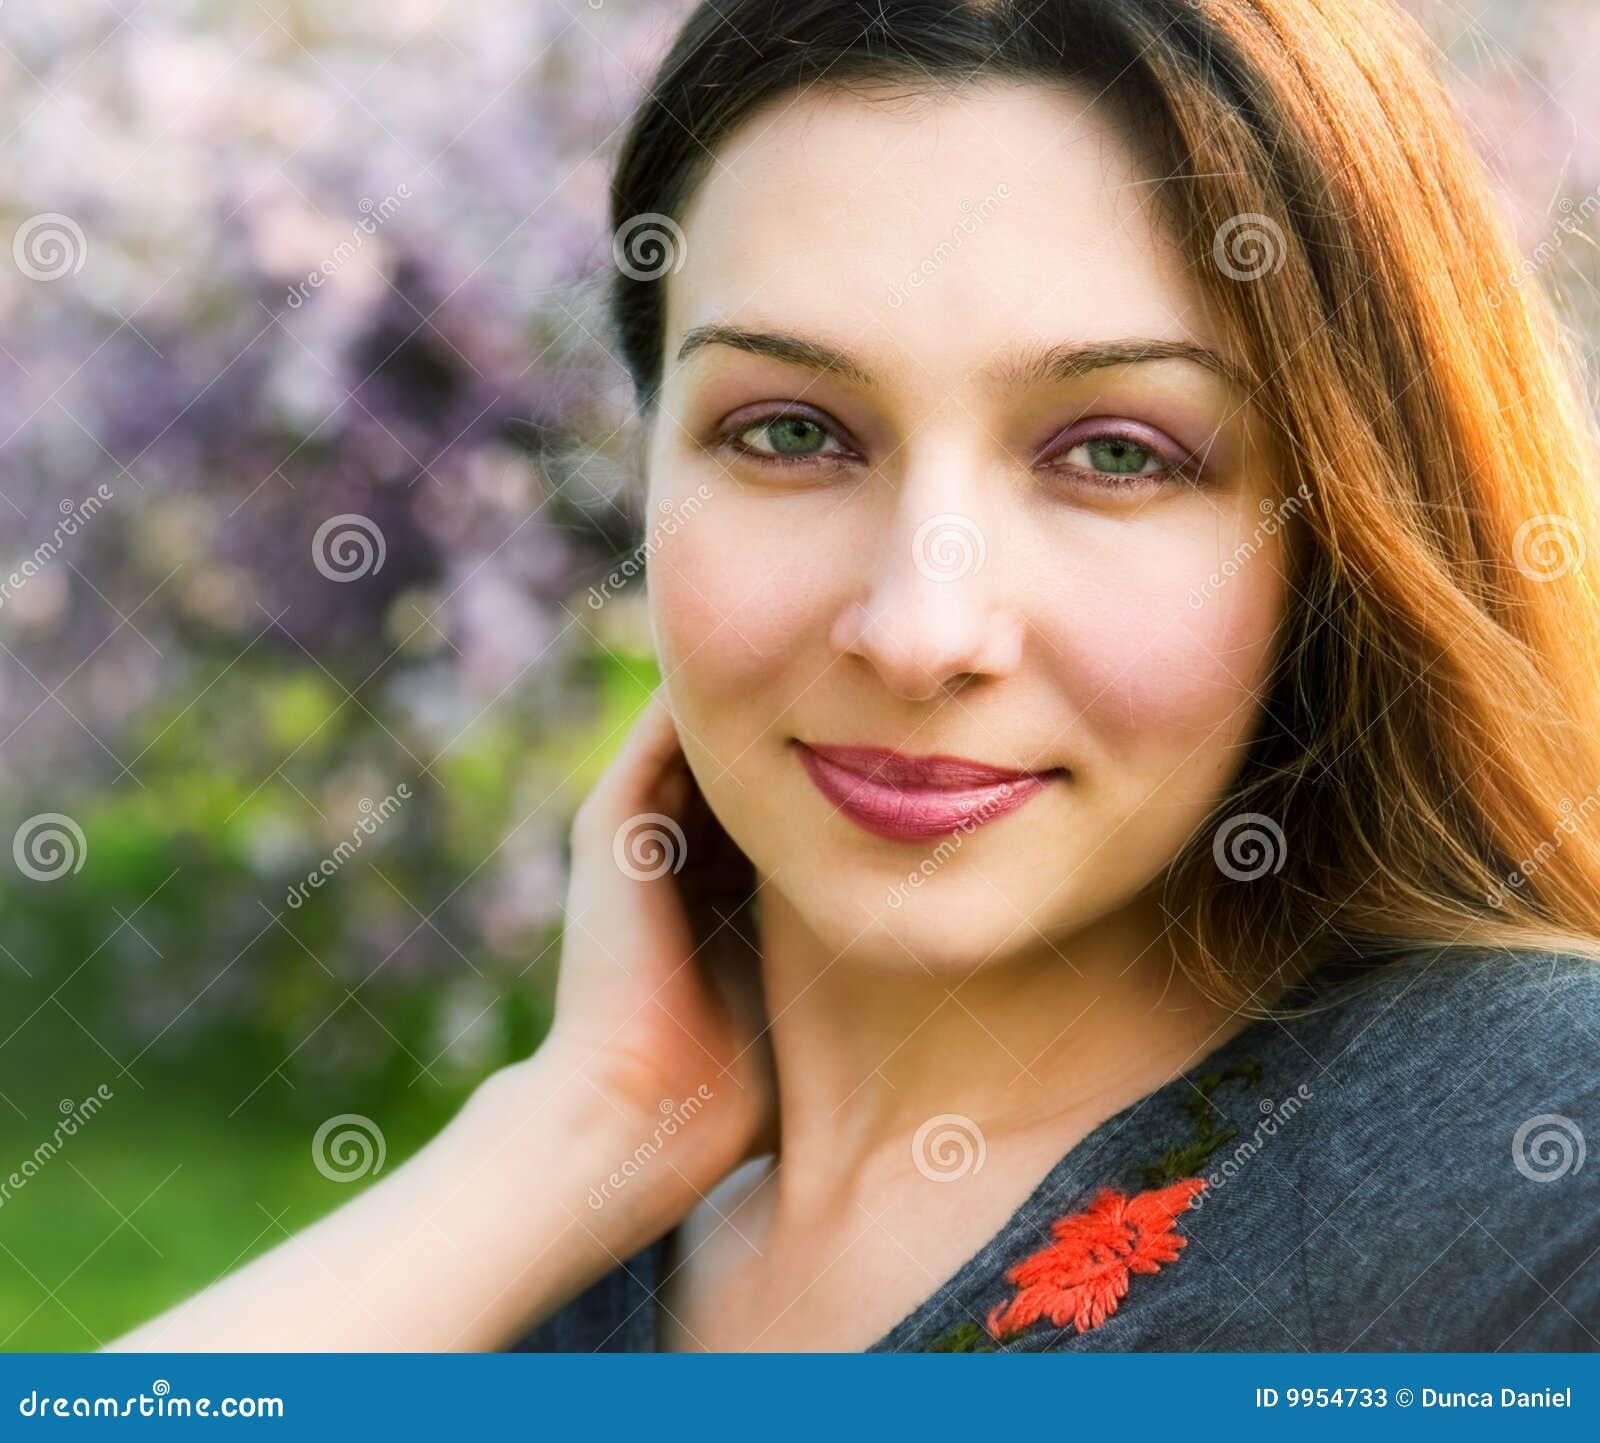 sorriso-da-mulher-bonita-sereno-sensual-